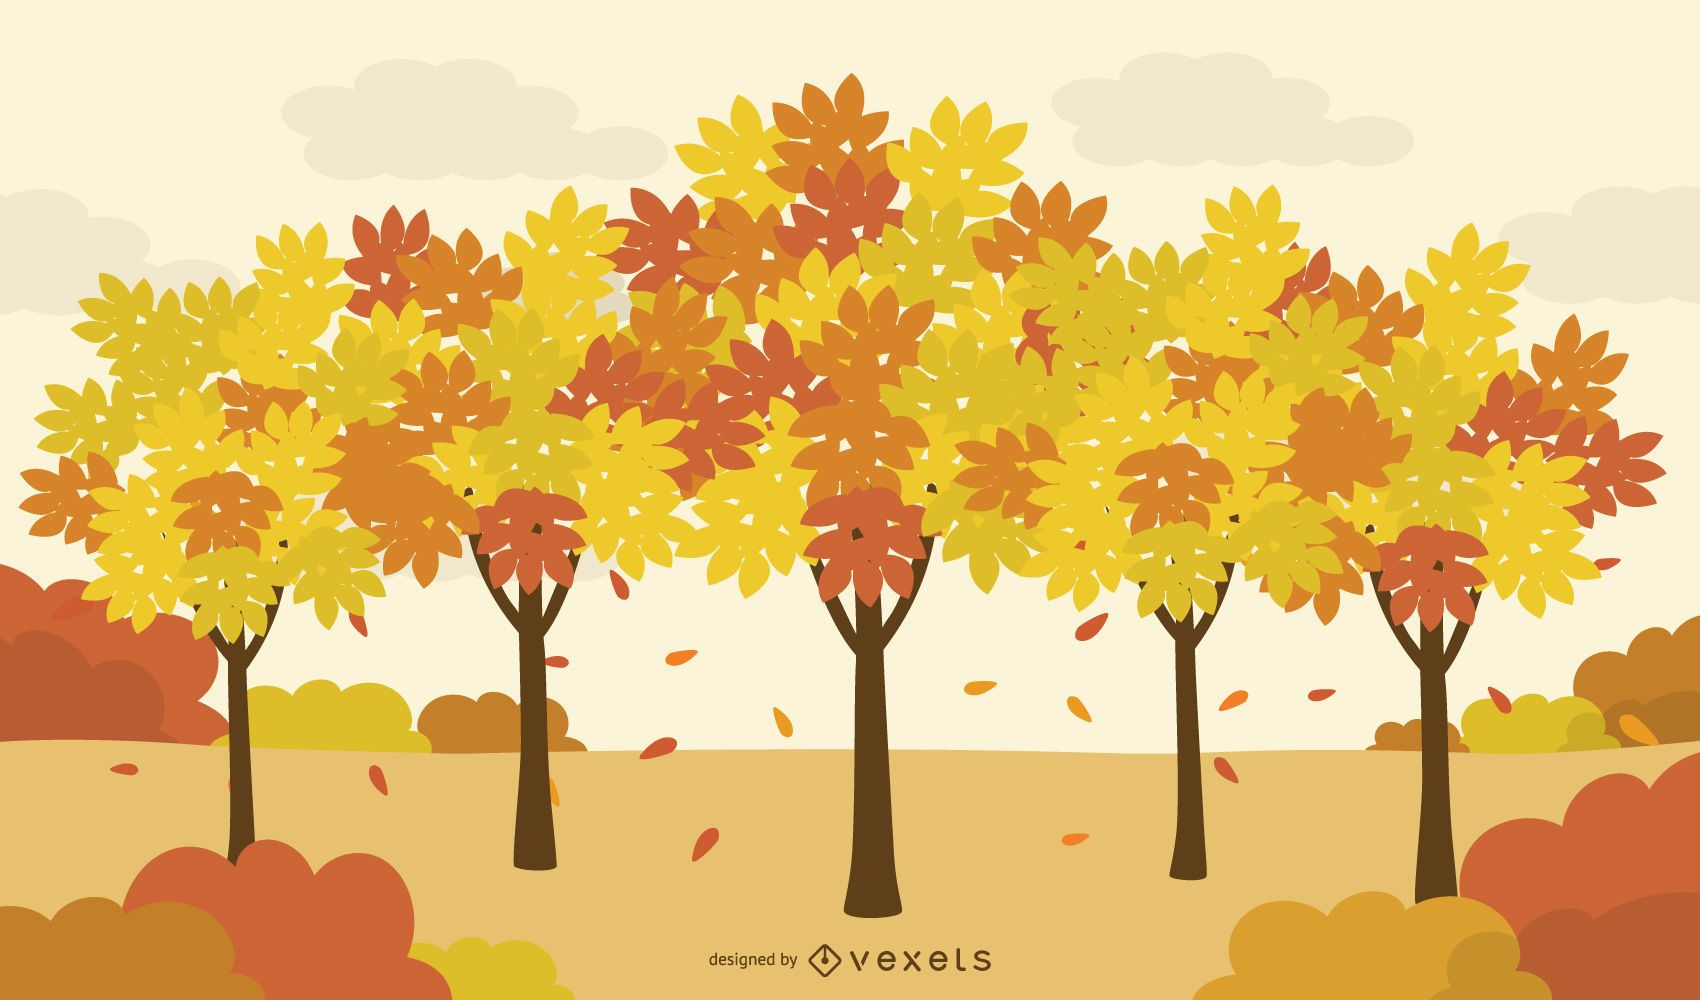 Desenhos Animados De árvores De Outono Baixar Vector